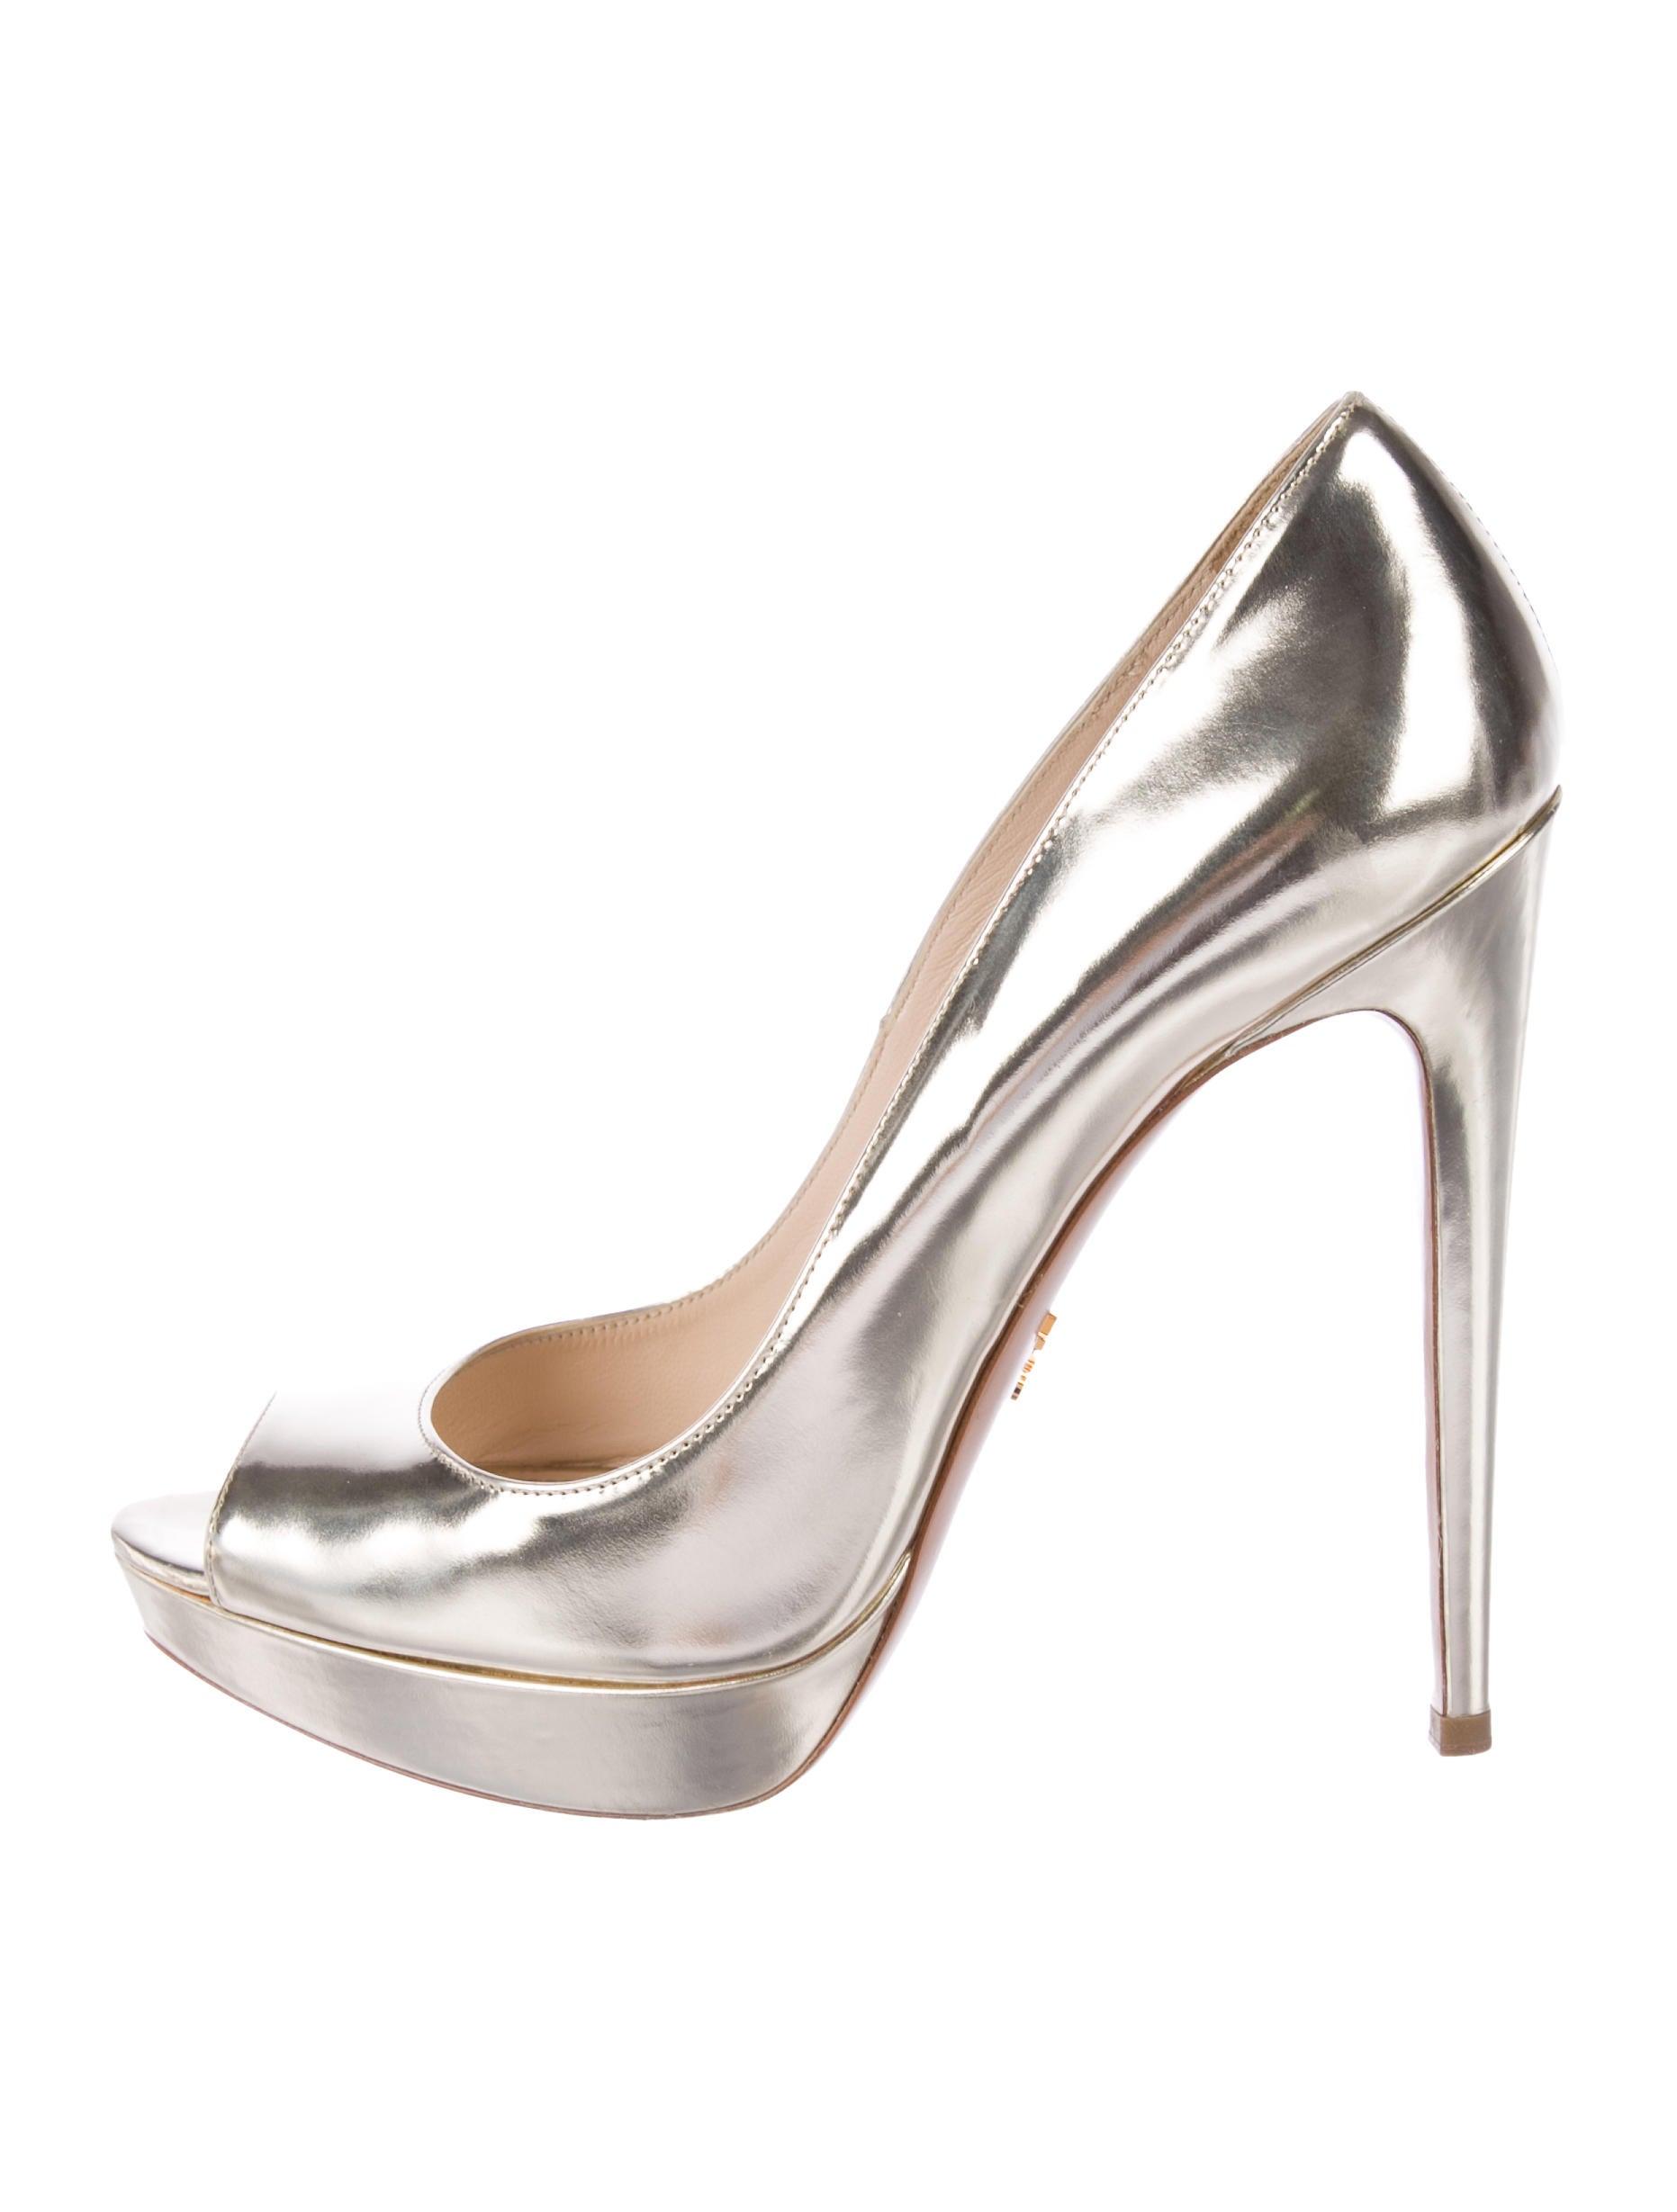 c594b386c Prada Metallic Peep-Toe Pumps - Shoes - PRA246537